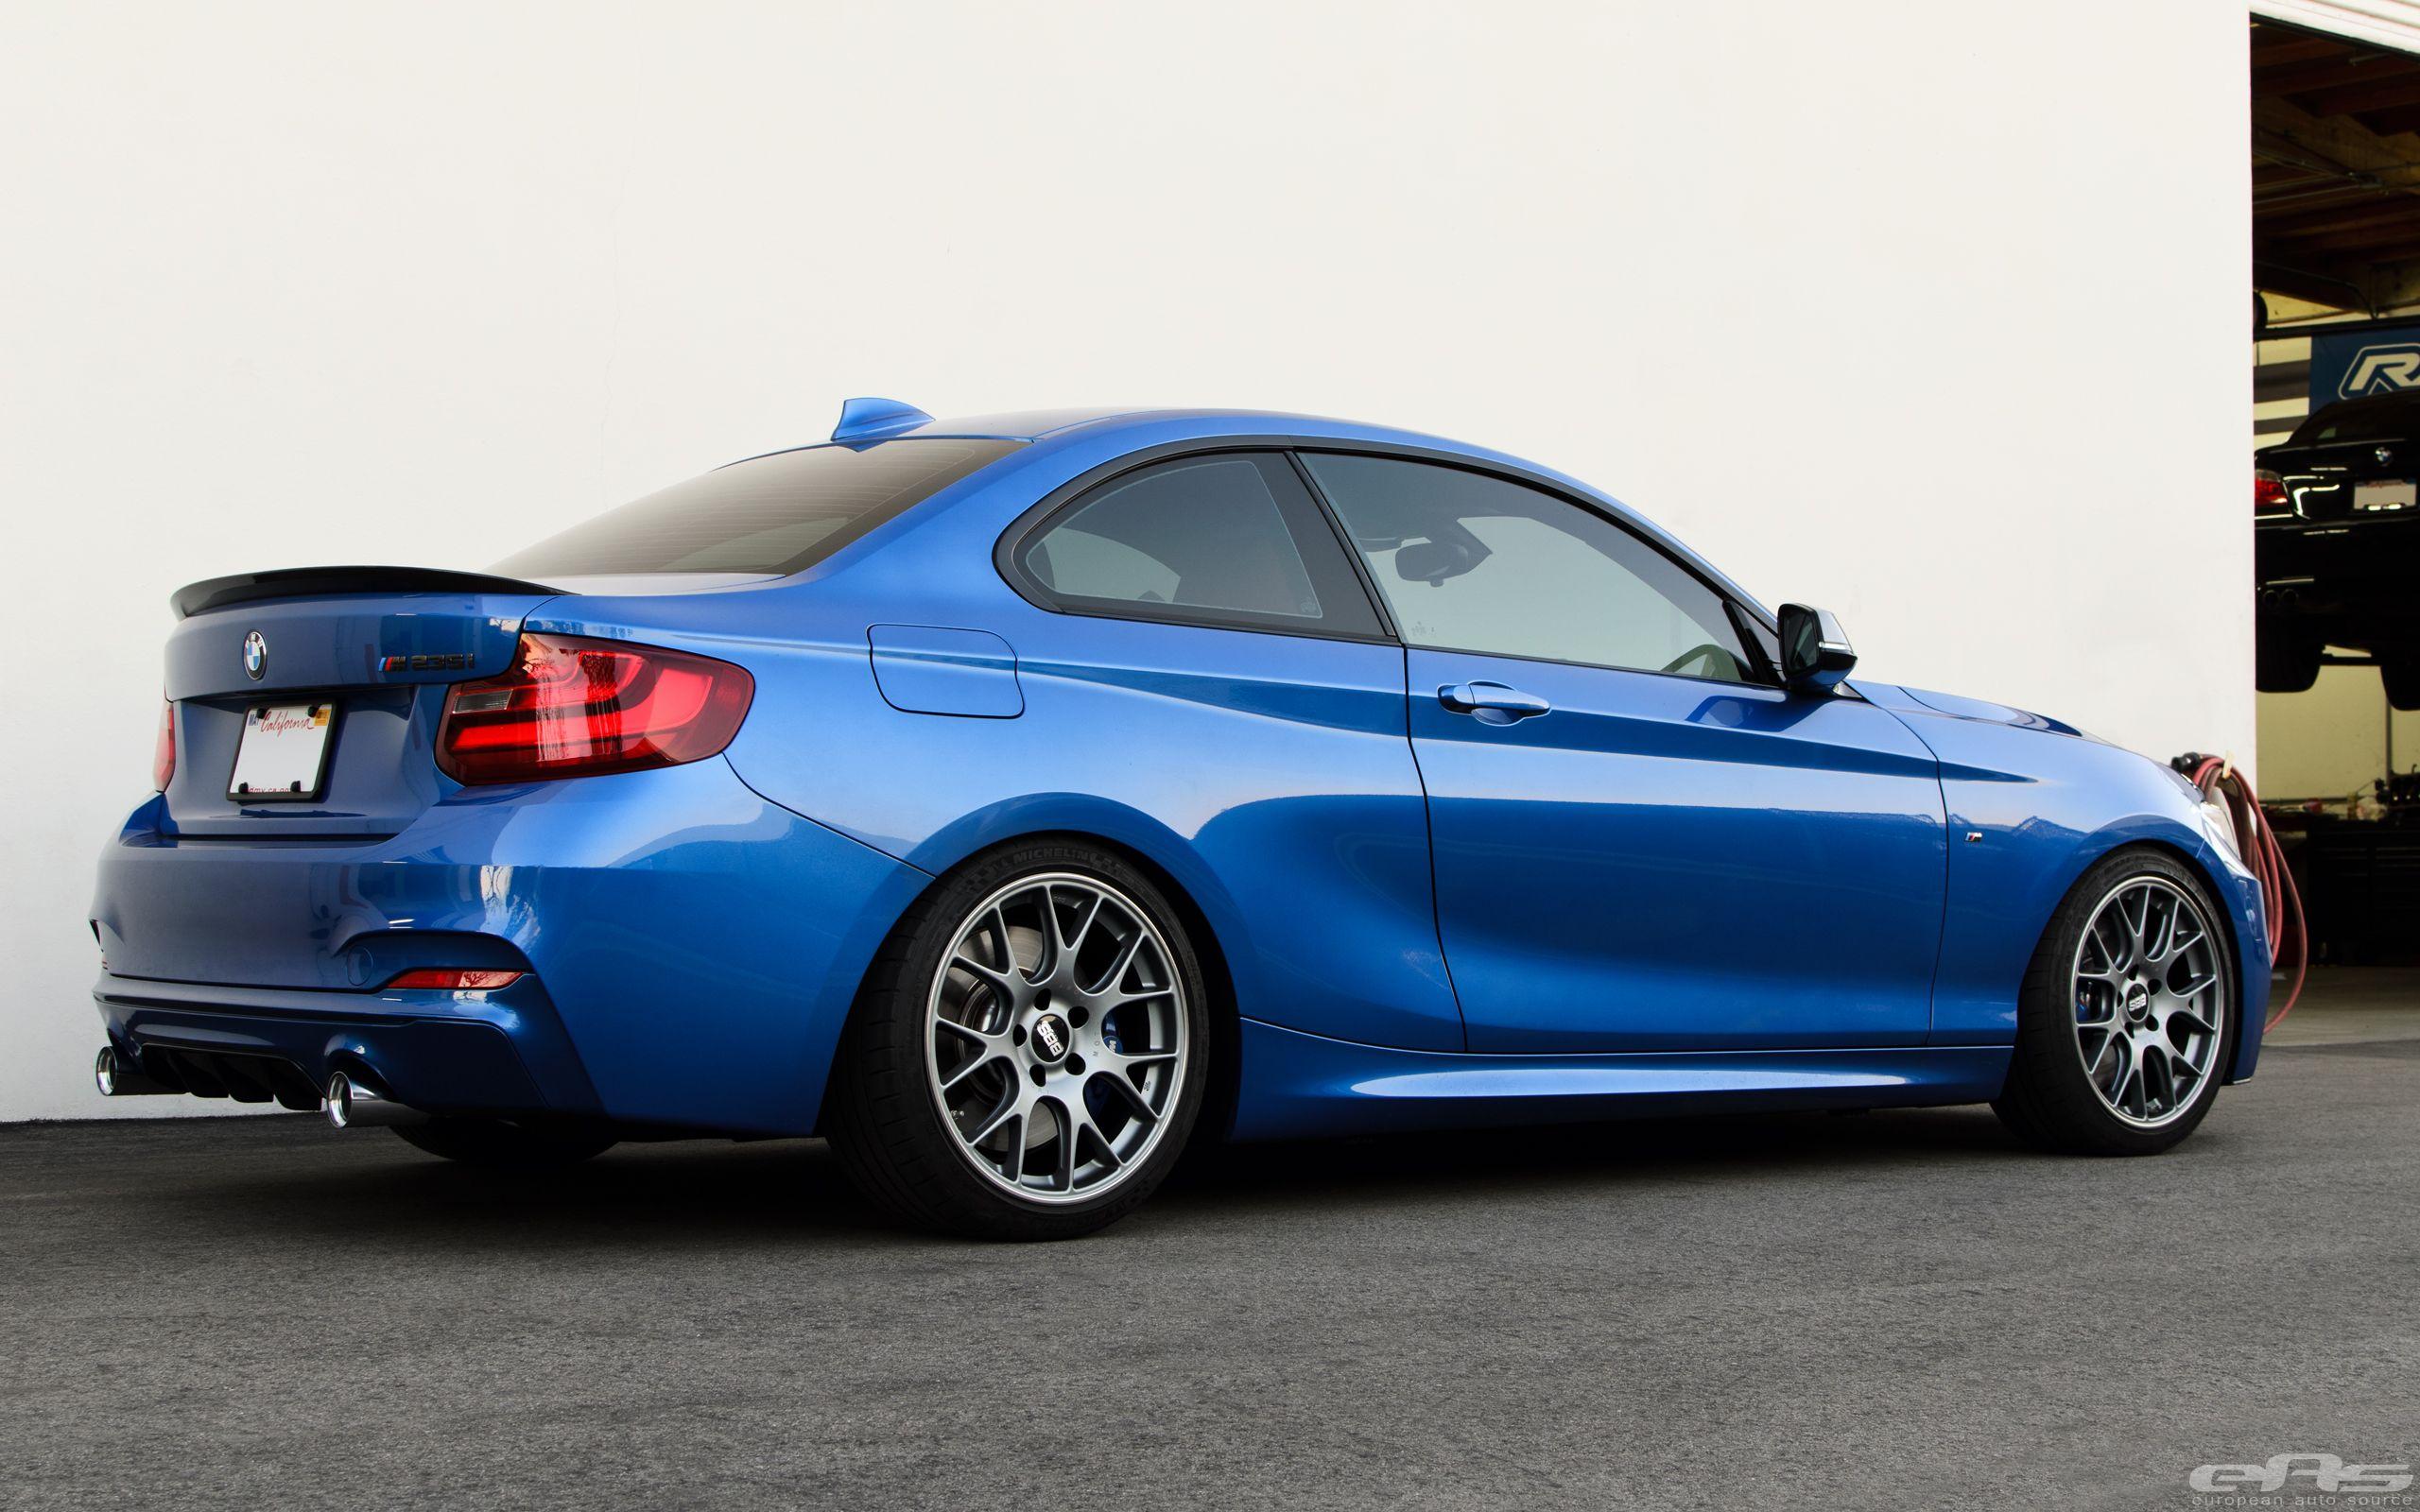 Gorgeous Estoril Blue Bmw M235i Gets Transformed Into A Beast Estoril Blue Bmw Performance Parts